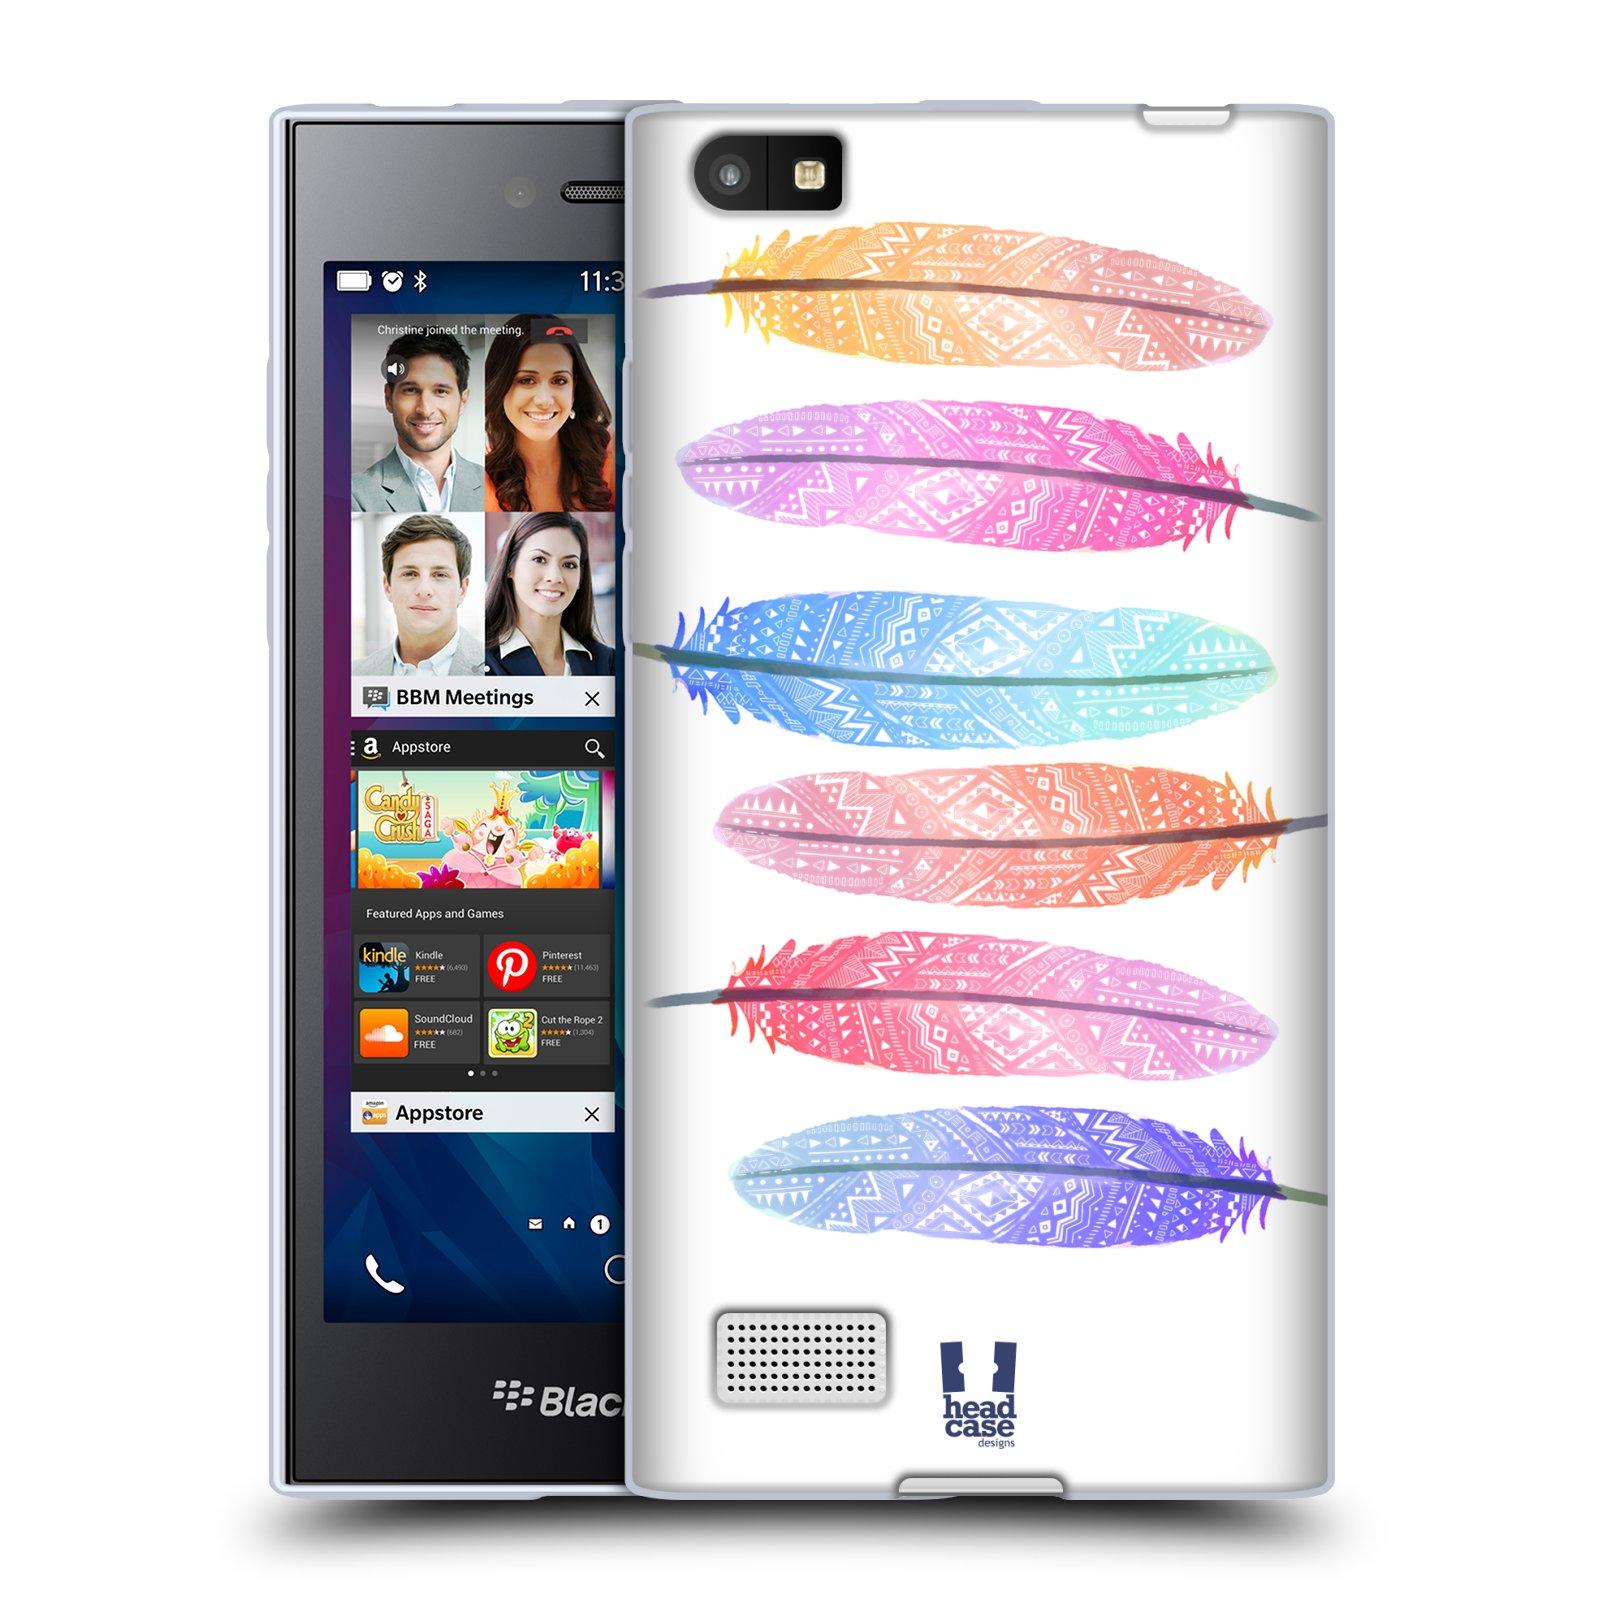 Silikonové pouzdro na mobil Blackberry Leap HEAD CASE AZTEC PÍRKA SILUETY